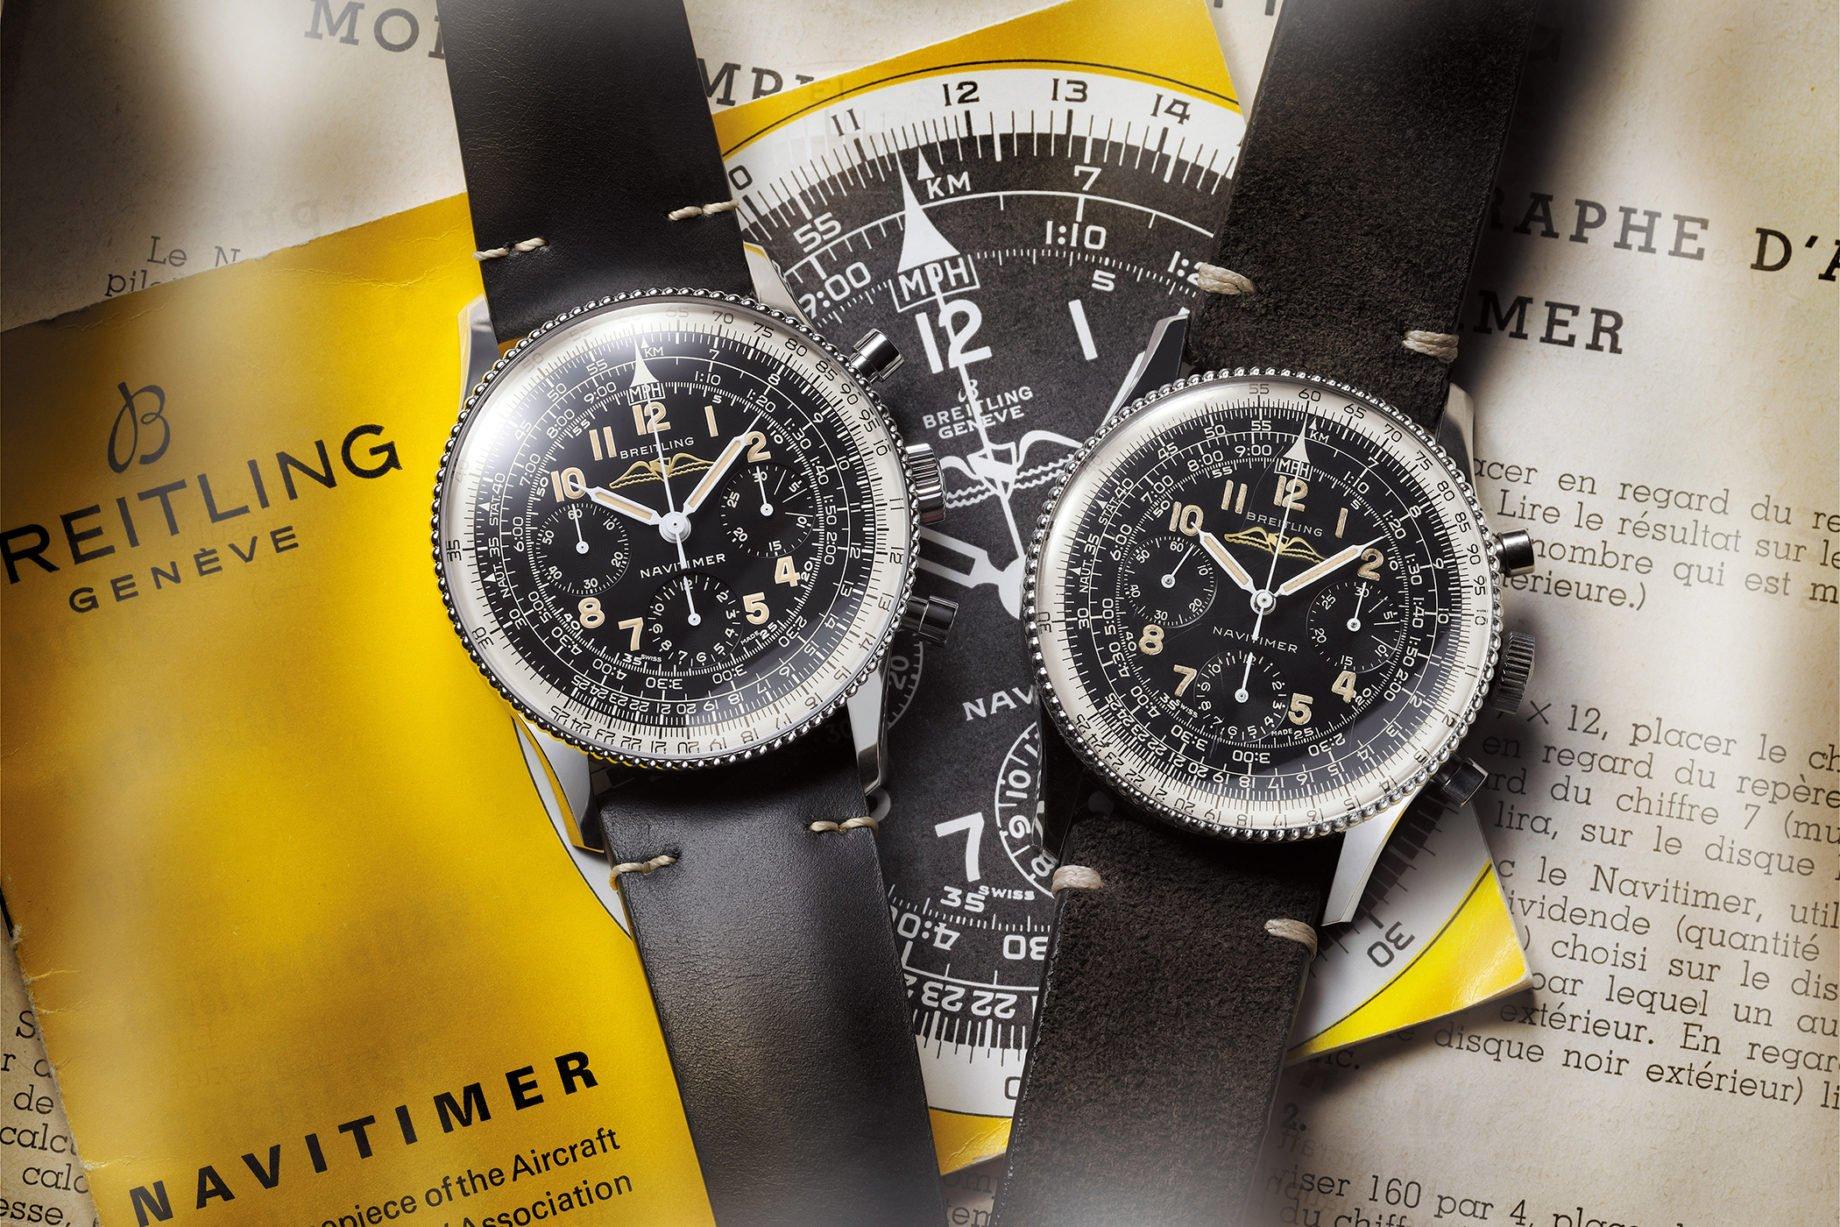 Breitling Navitimer: oryginał (po prawej) i Ref. 806 1959 Re-edition